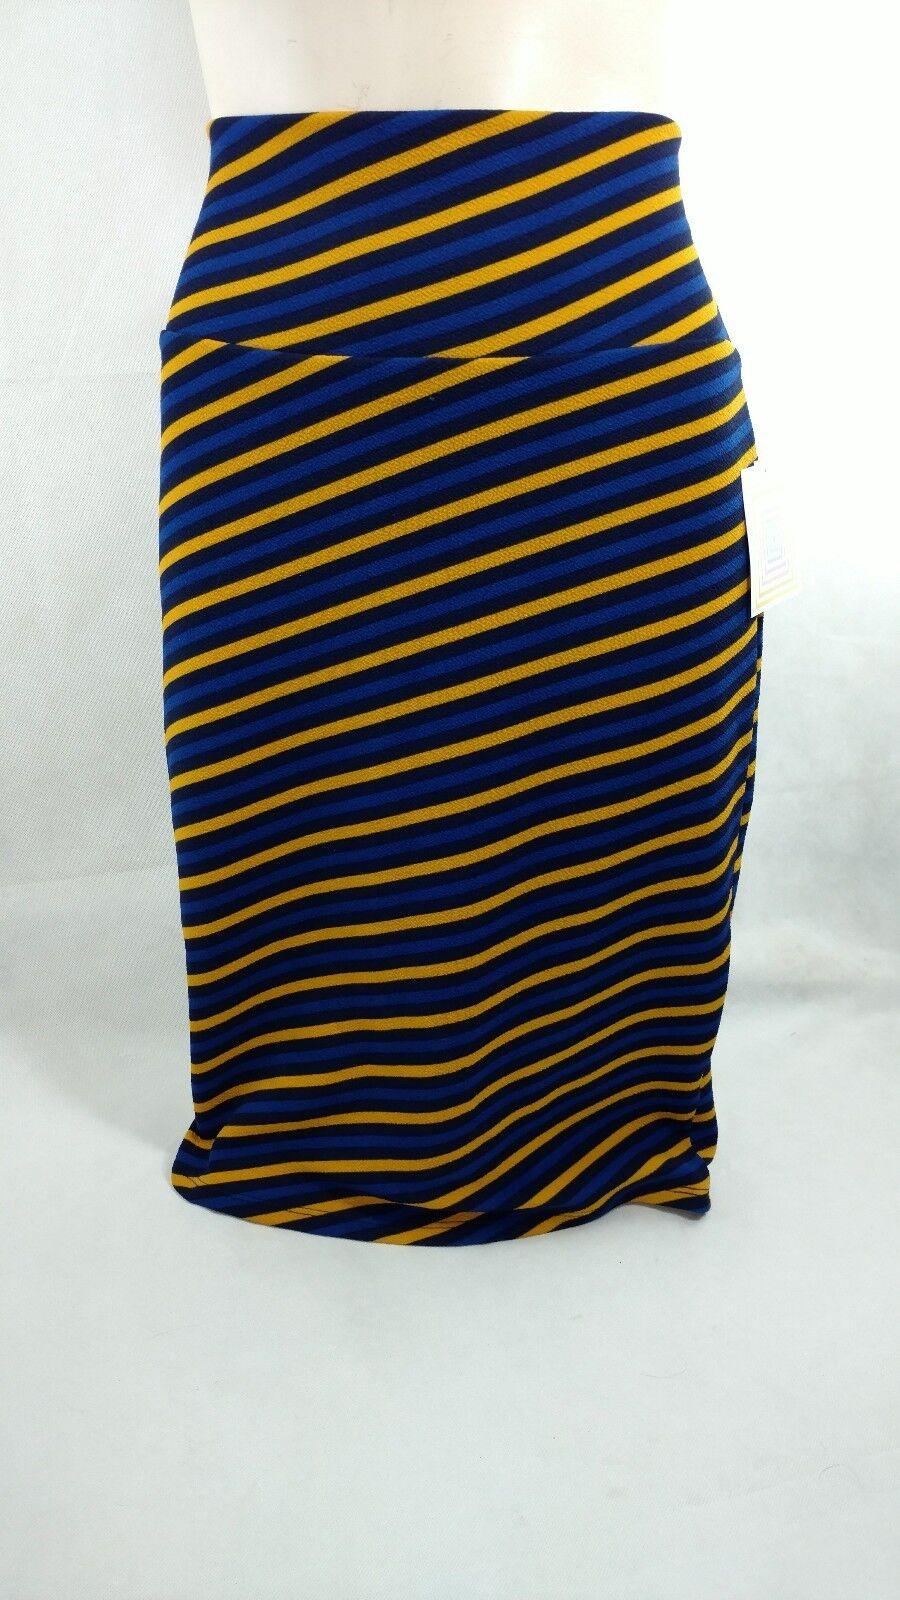 LulaRoe Womens Sz S Cassie Skirt Diagonal Striped gold Royal bluee Navy